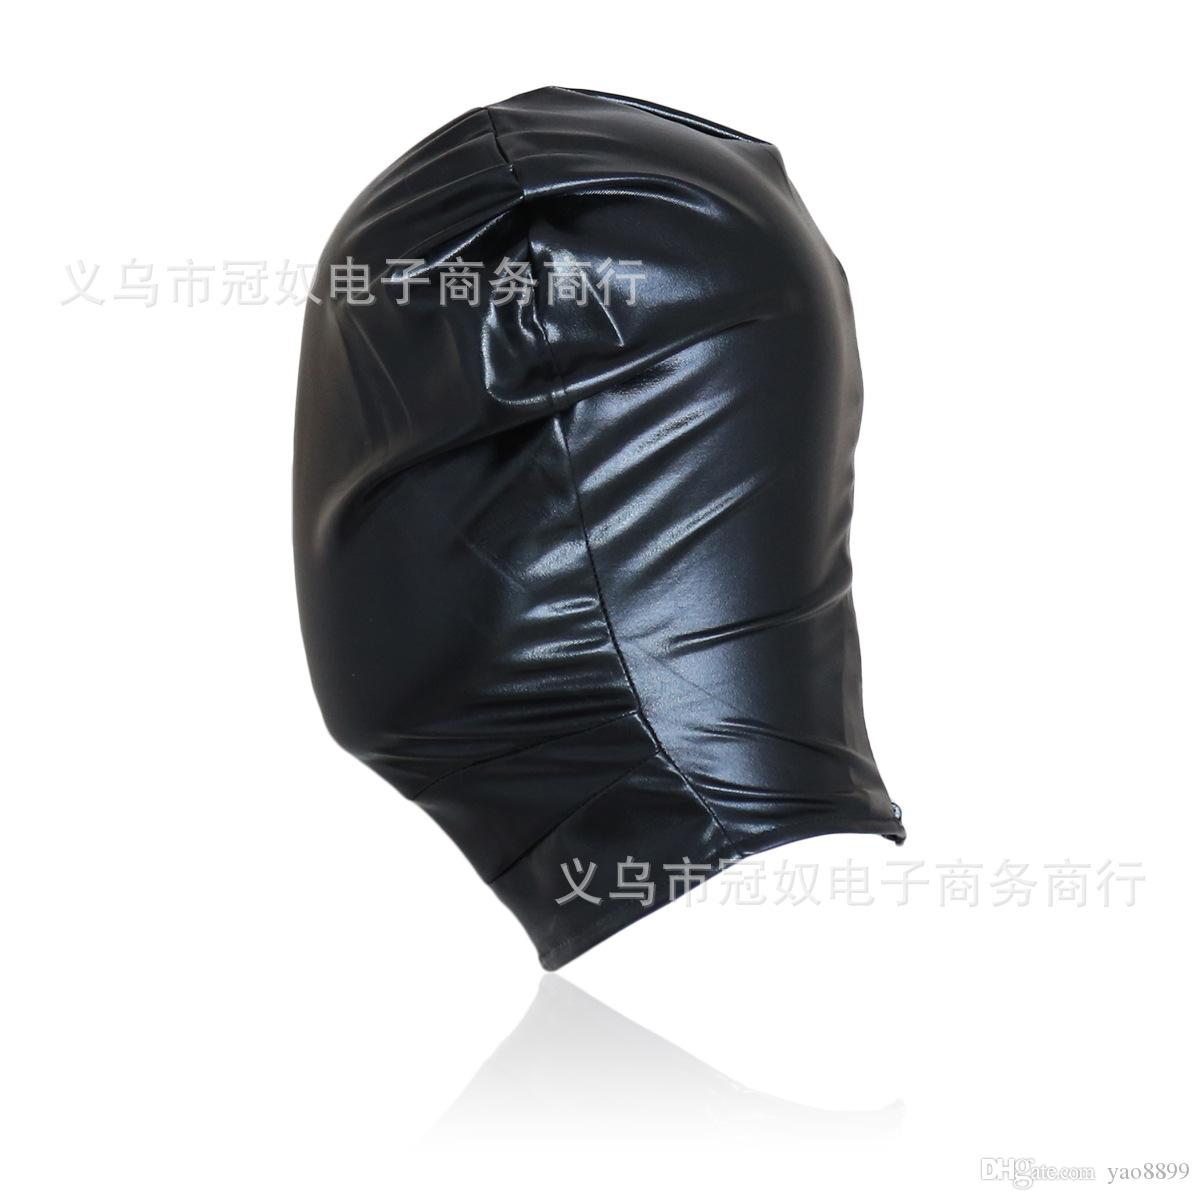 High quality leather bondage hood full mask fetish face mask cap sex toys sex slave game for adults bondage device Q885